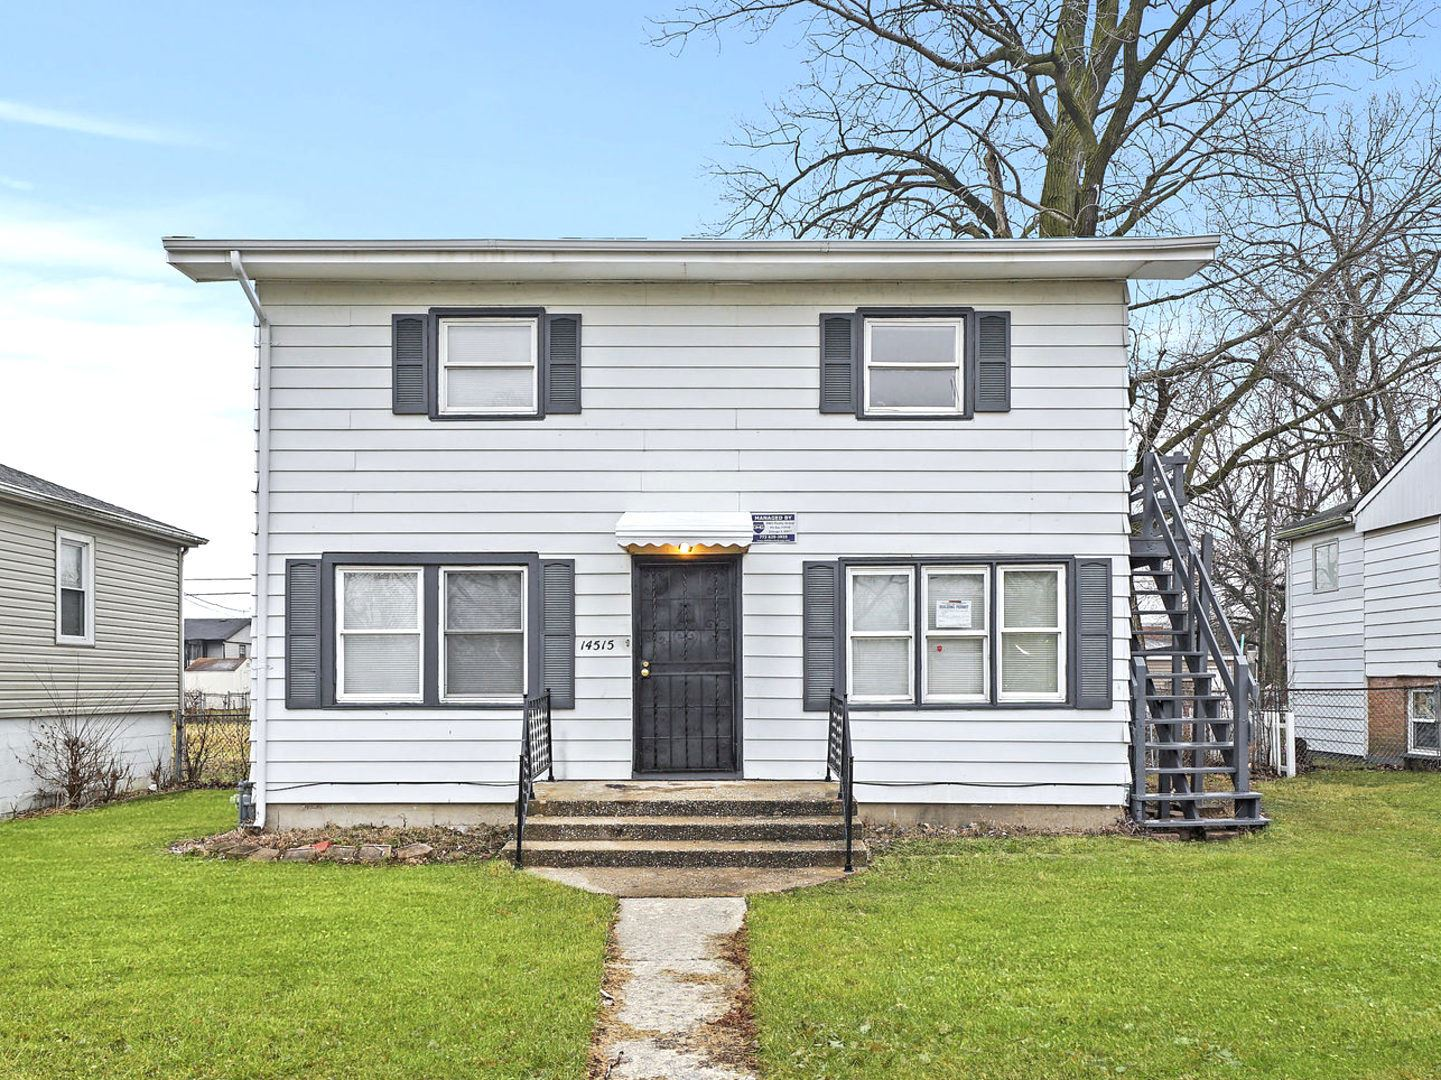 14515 Hoyne Avenue, Dixmoor, IL 60426 - #: 10735296